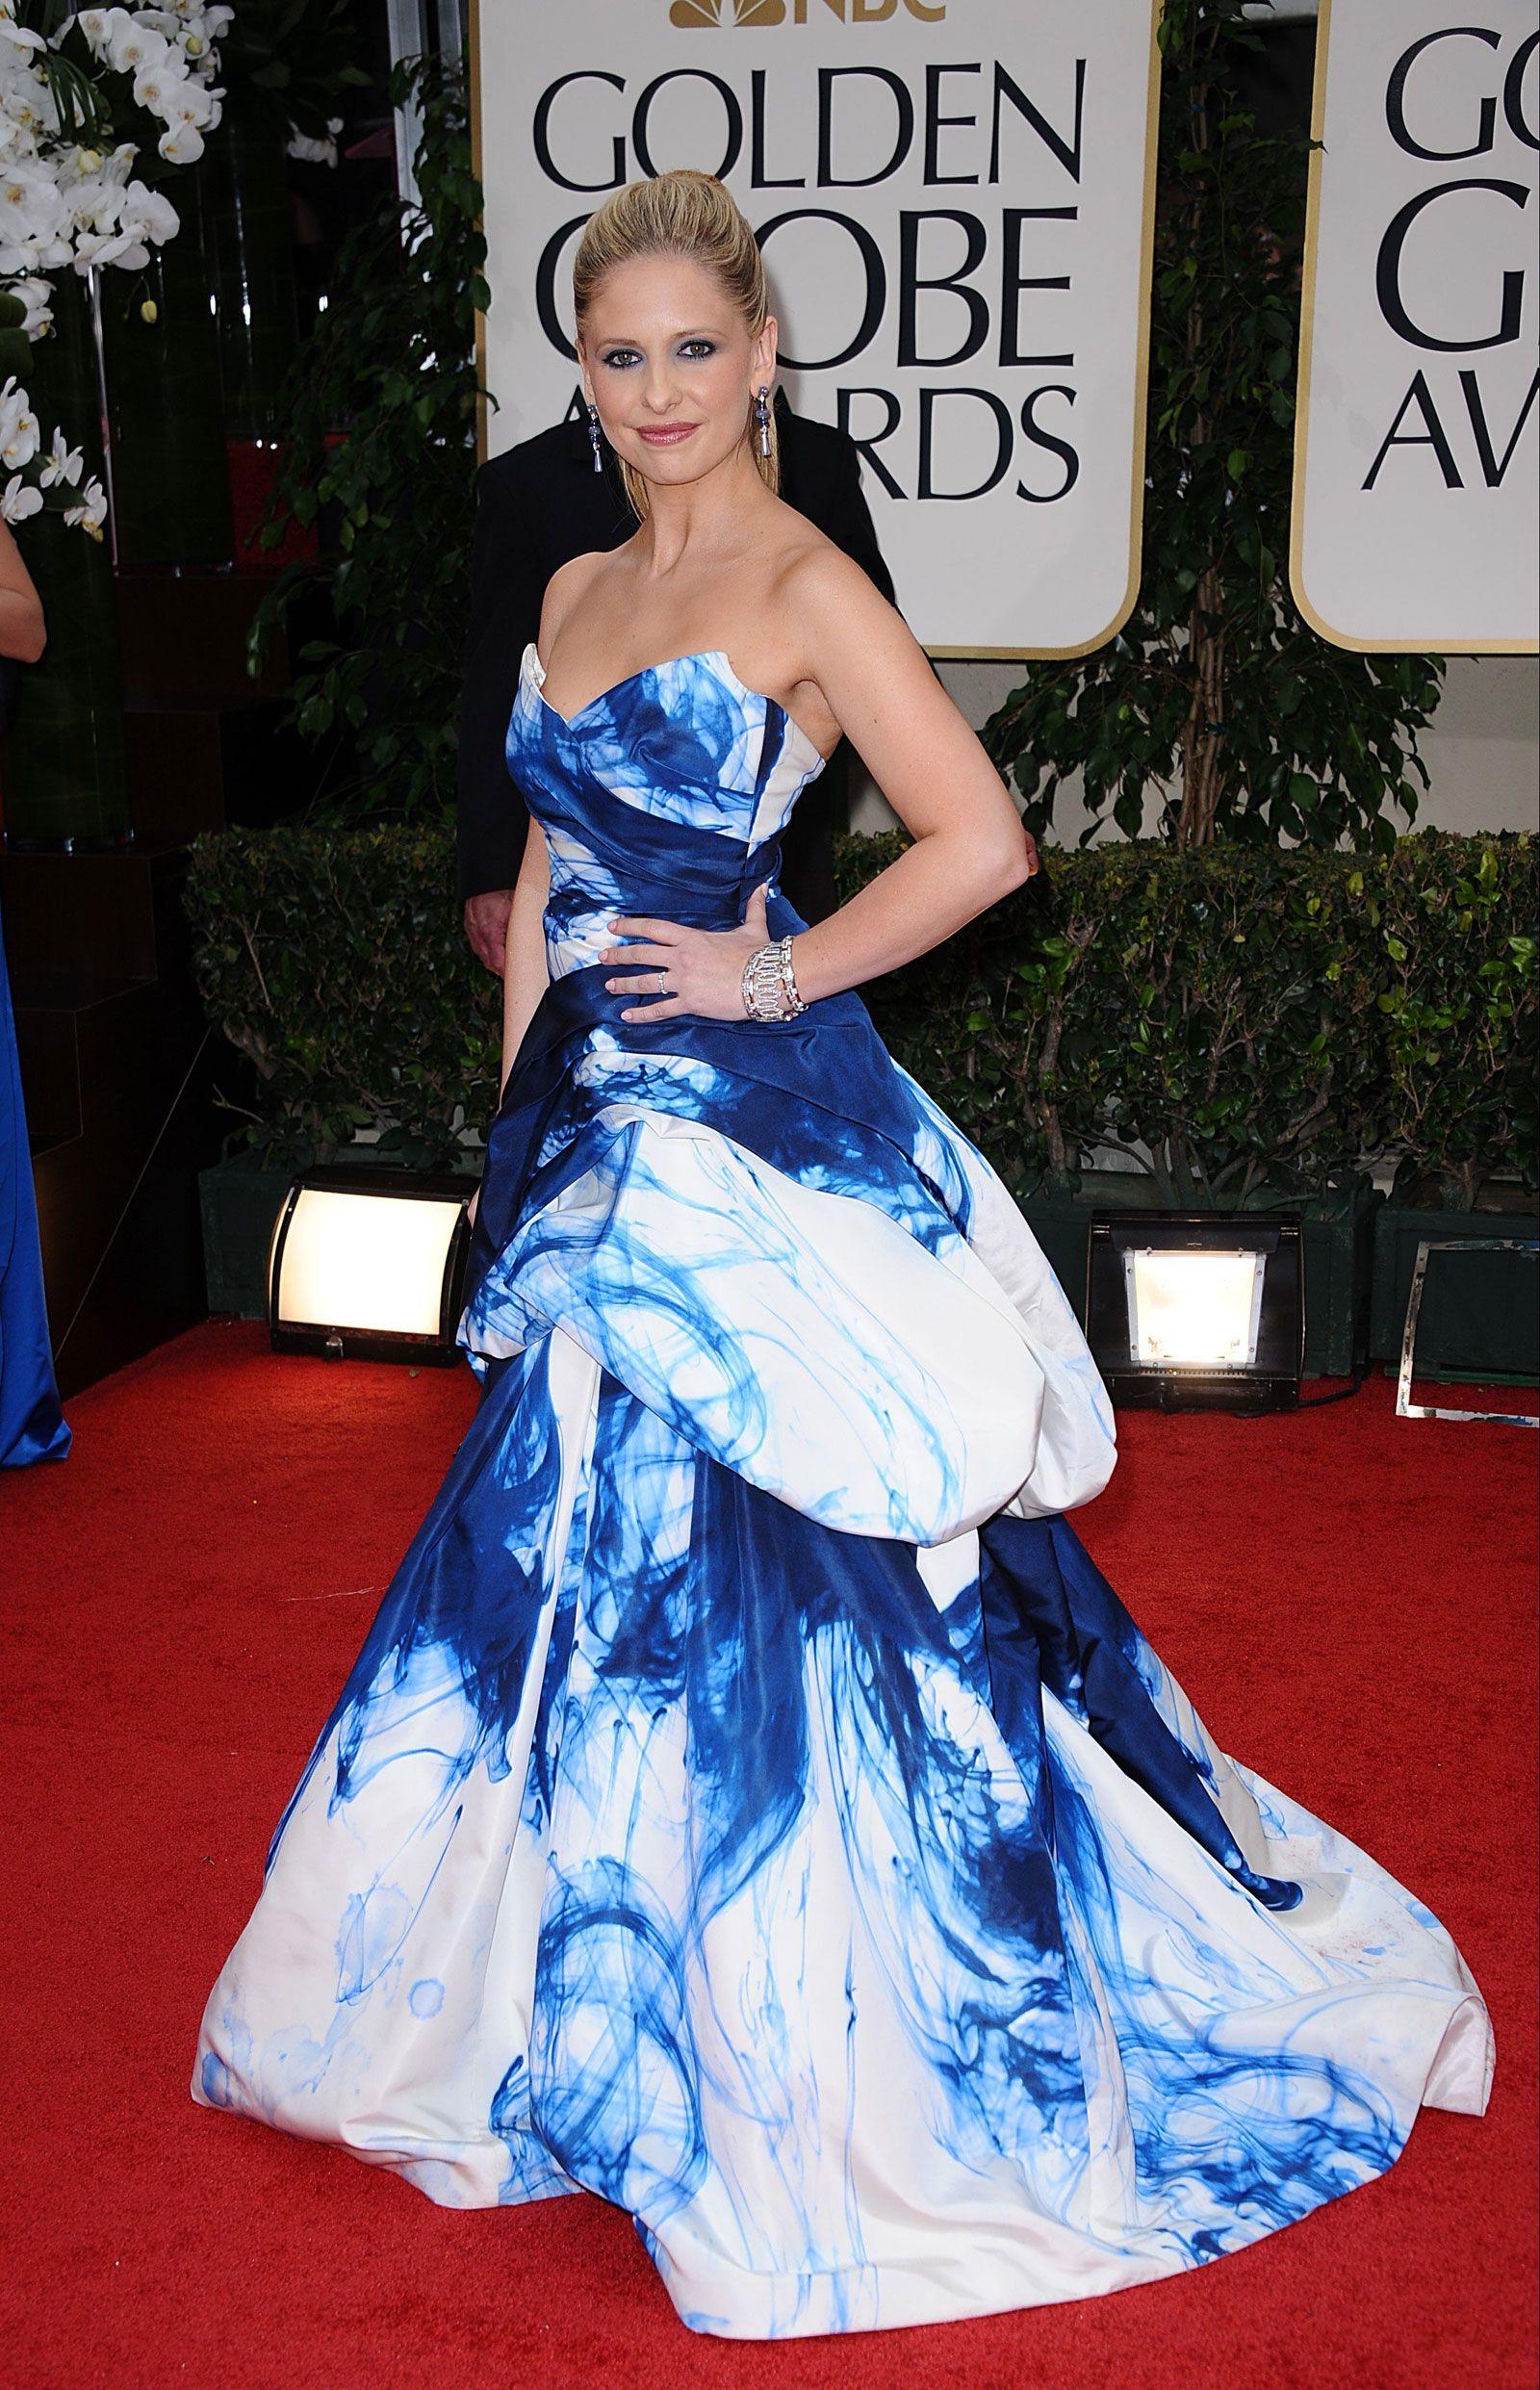 Sarah Michelle Gellar at 69th Annual Golden Globe Awards in Los Angeles